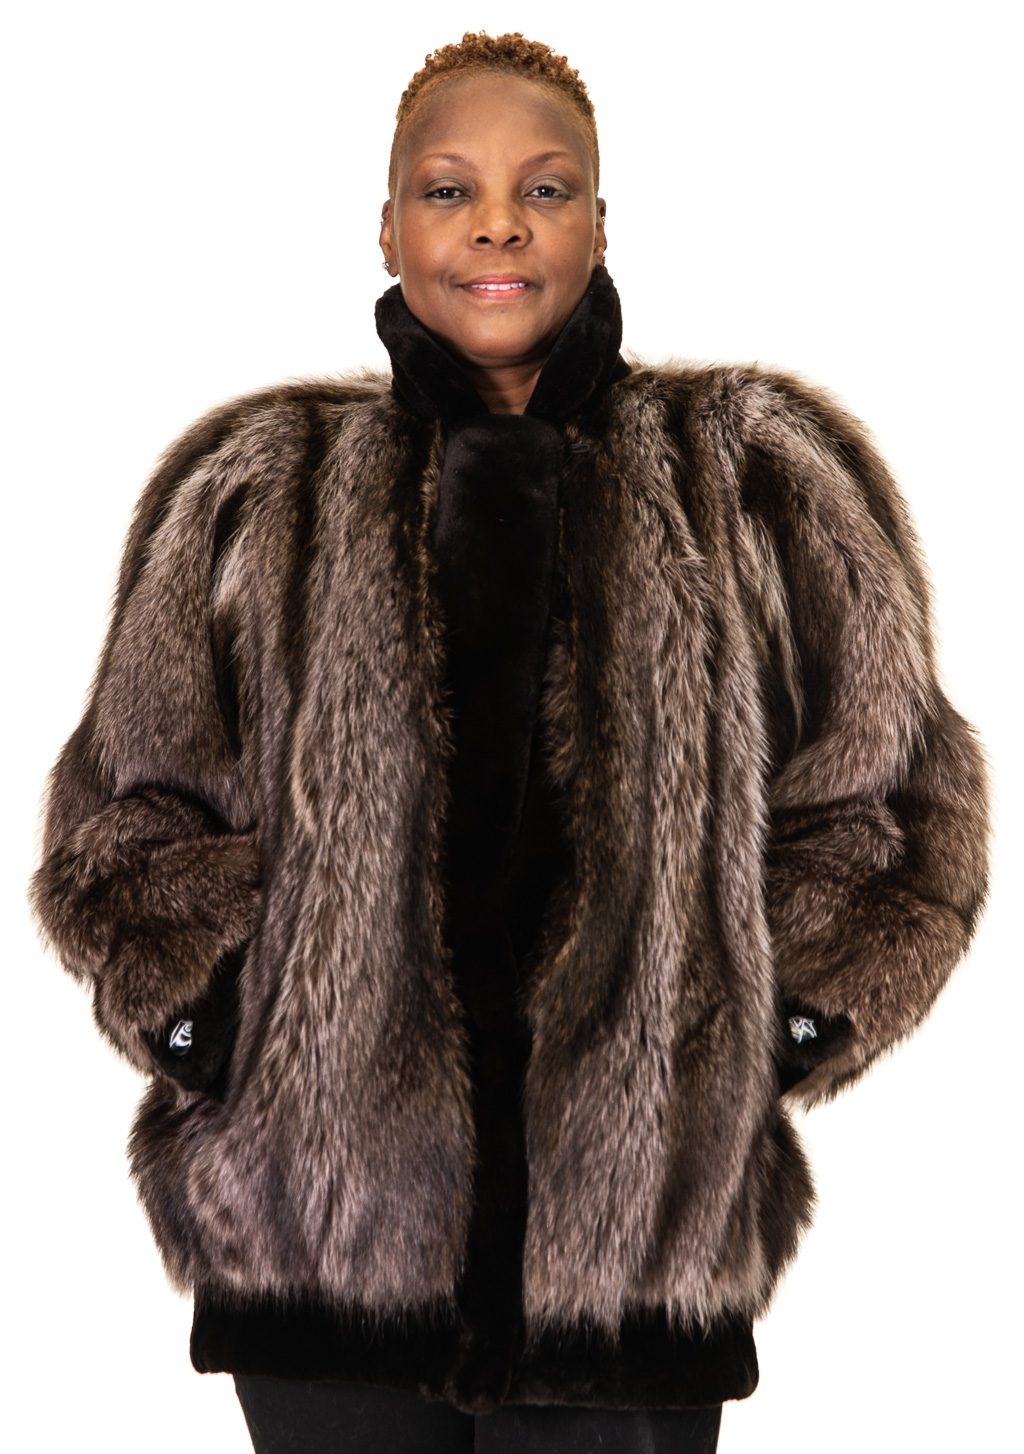 143 2 Raccoon Ugent Furs